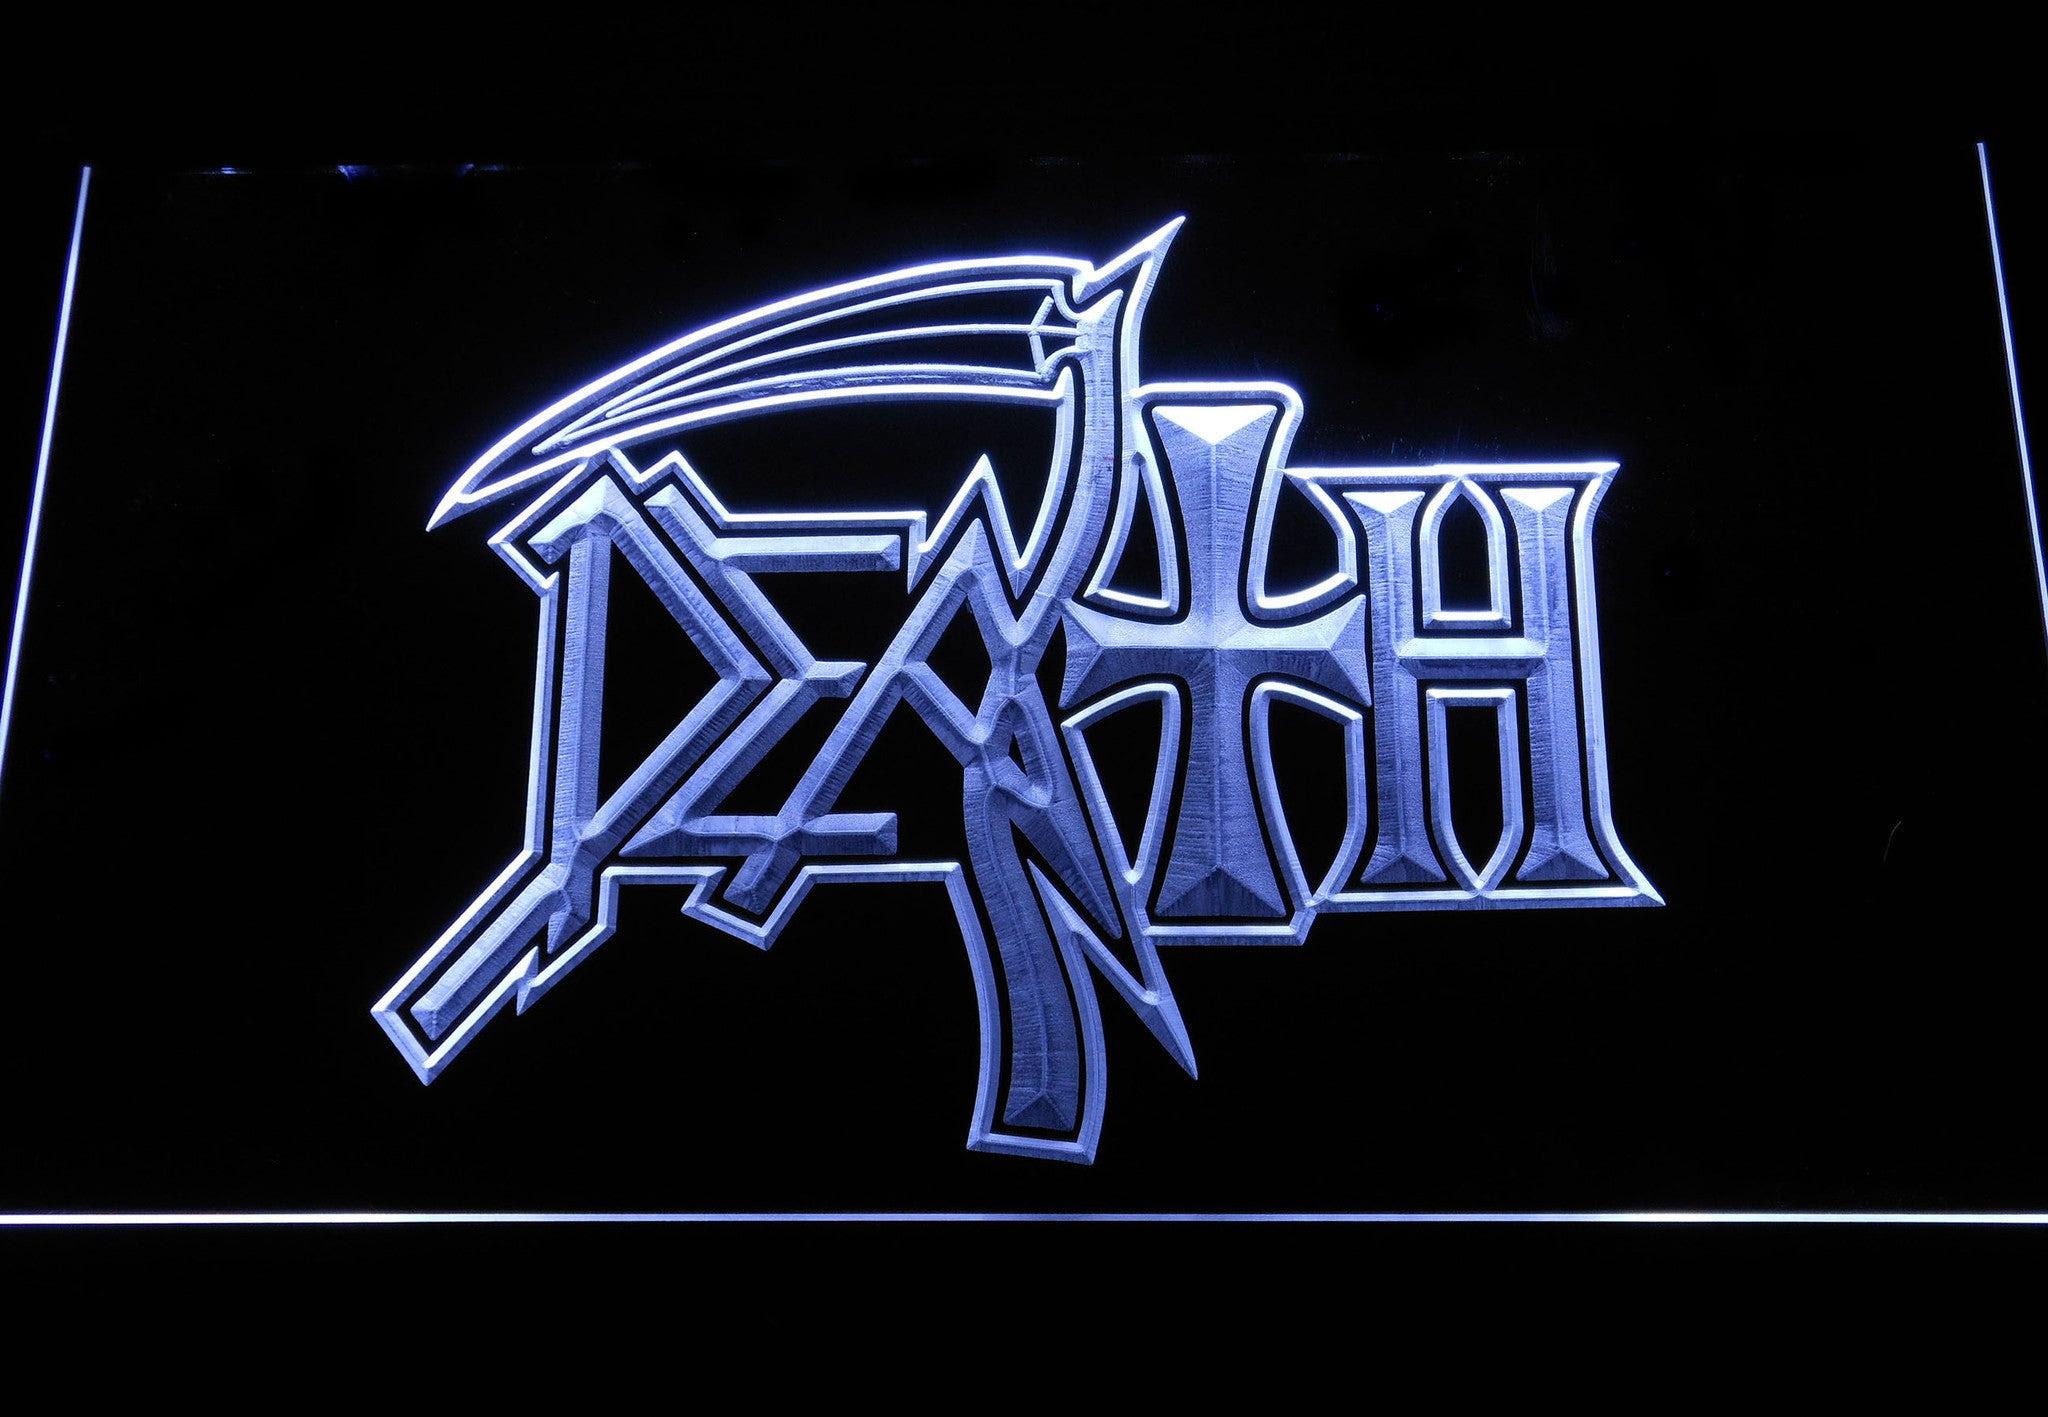 Death Logo LED Neon Sign   SafeSpecial